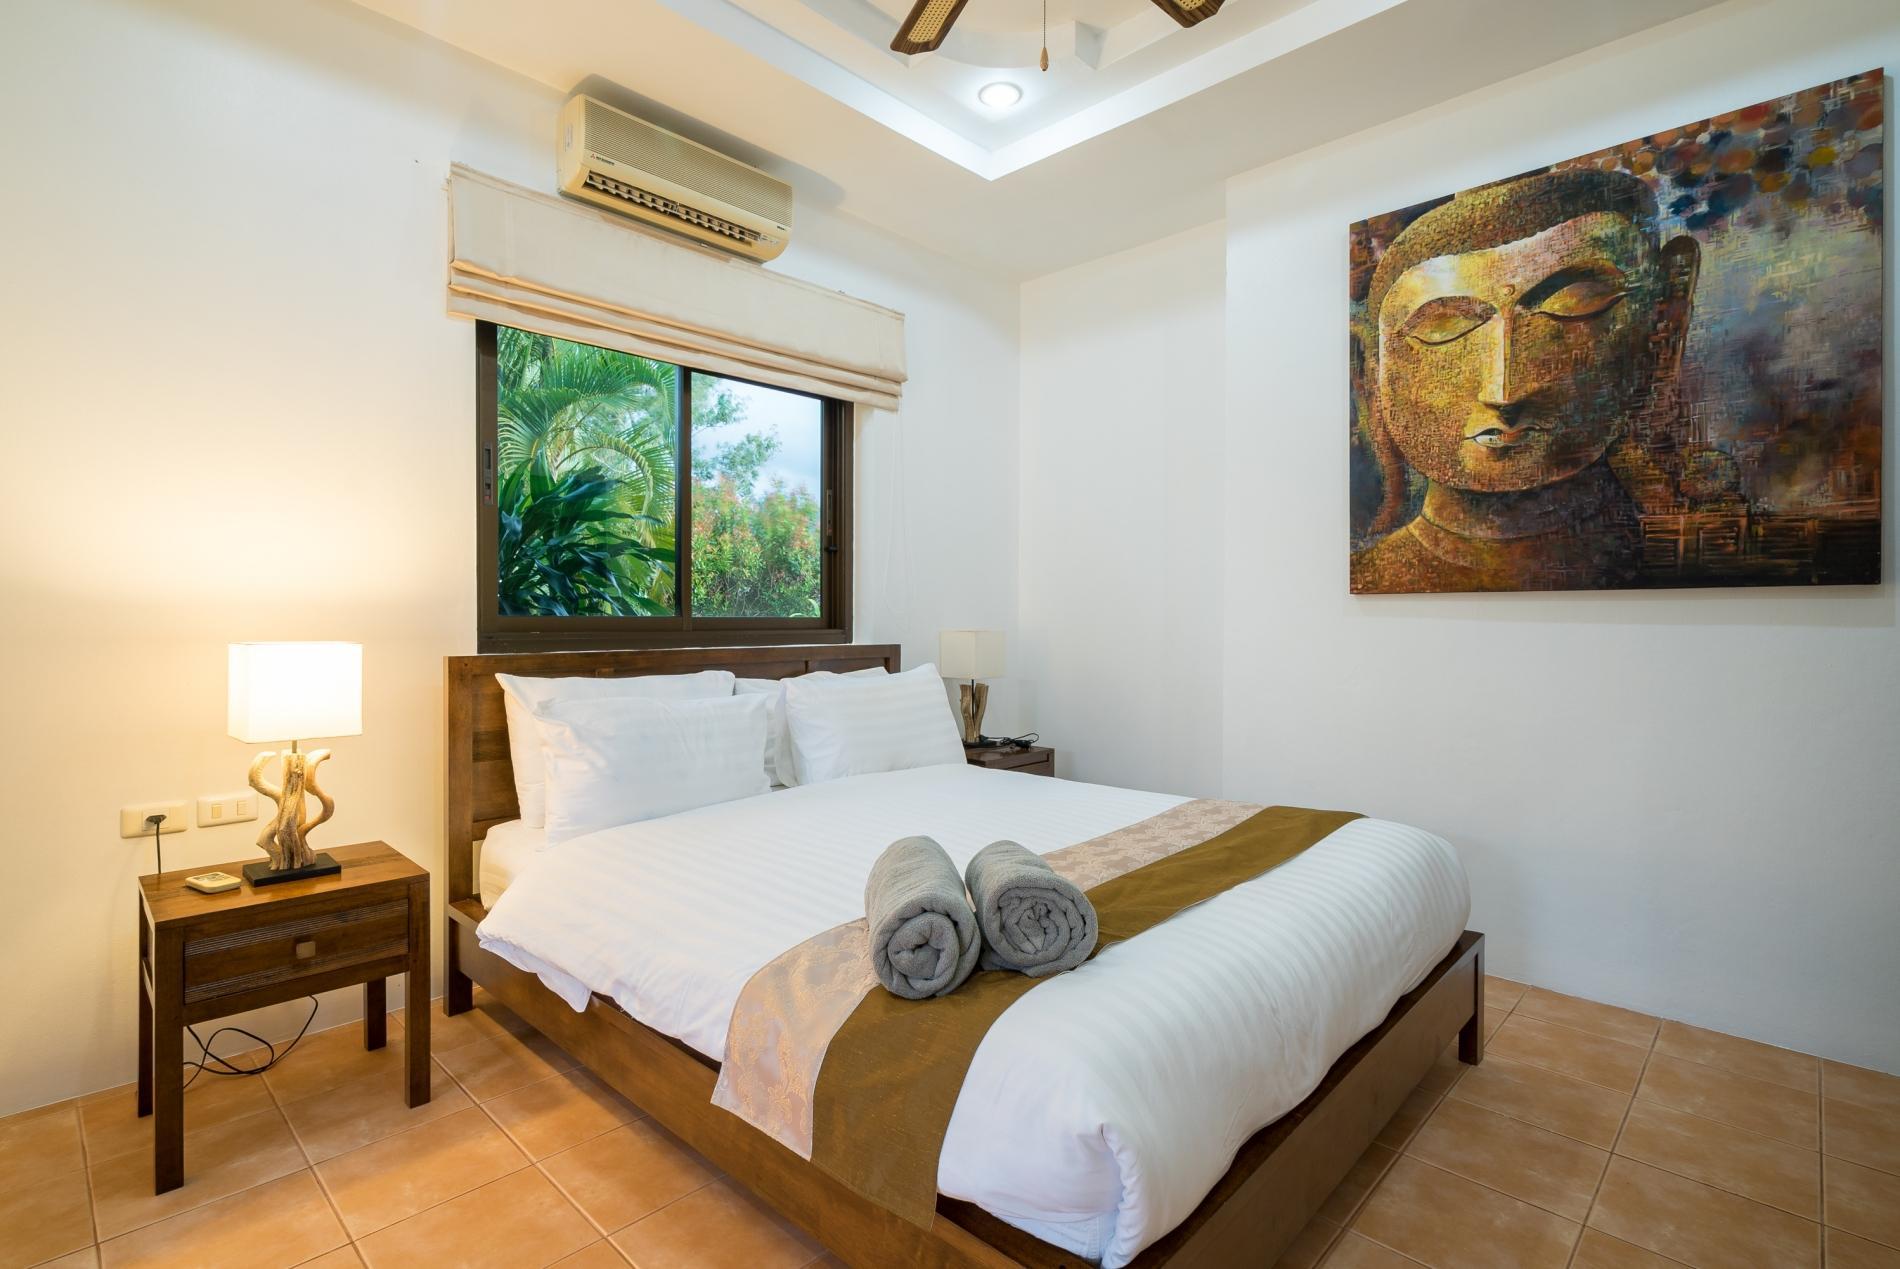 Apartment Pasak soi 3 - Convenient pool villa in quiet location  near Laguna  Boat avenue photo 19552924